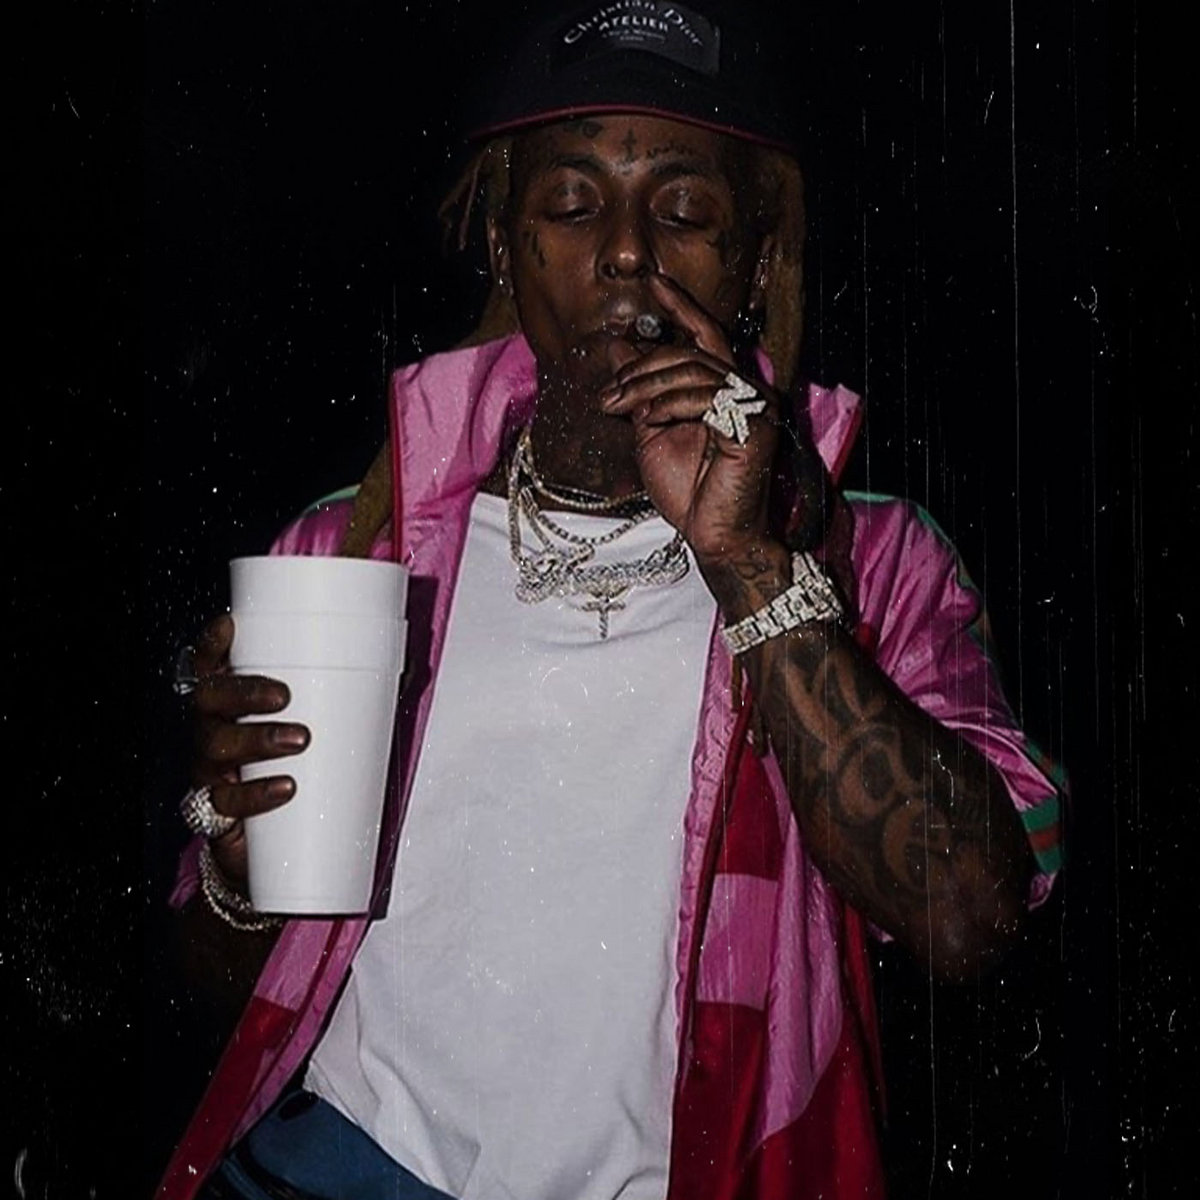 Lil Wayne x Zaytoven Type Beat ''Double Cup Love'' | Prod